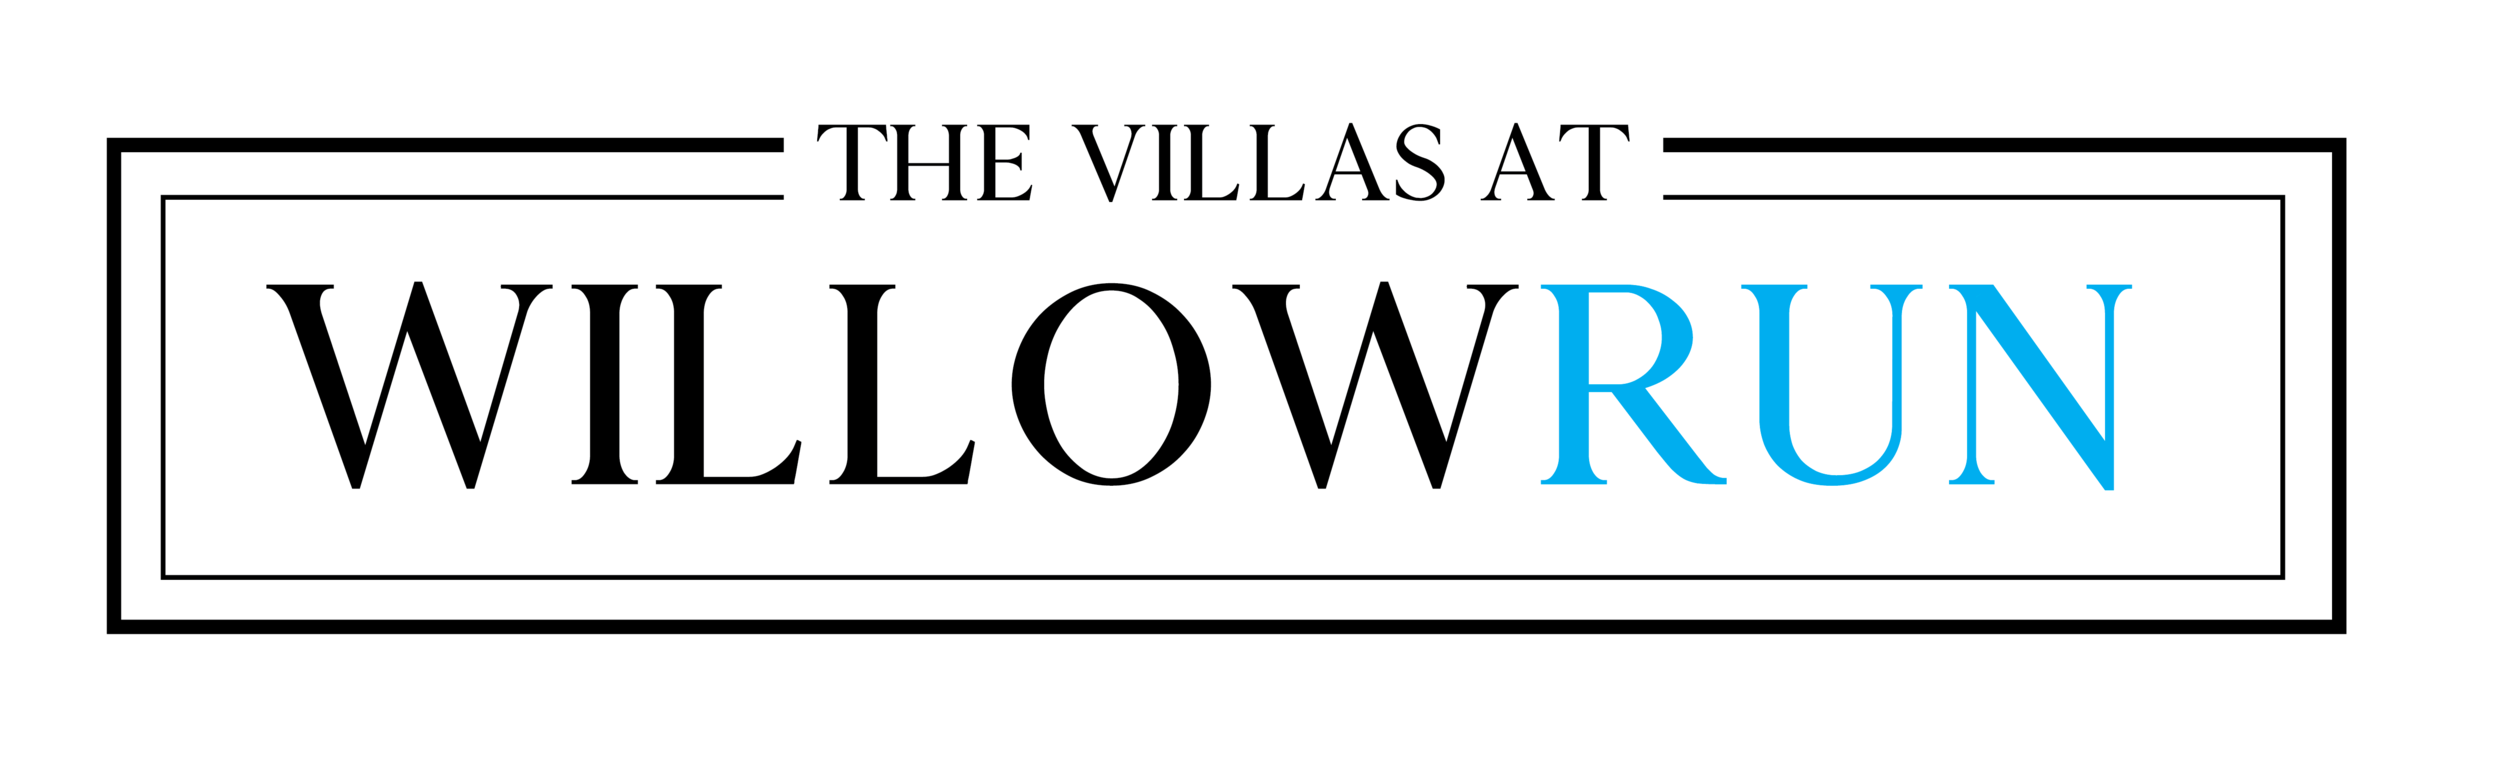 willow run-01.png